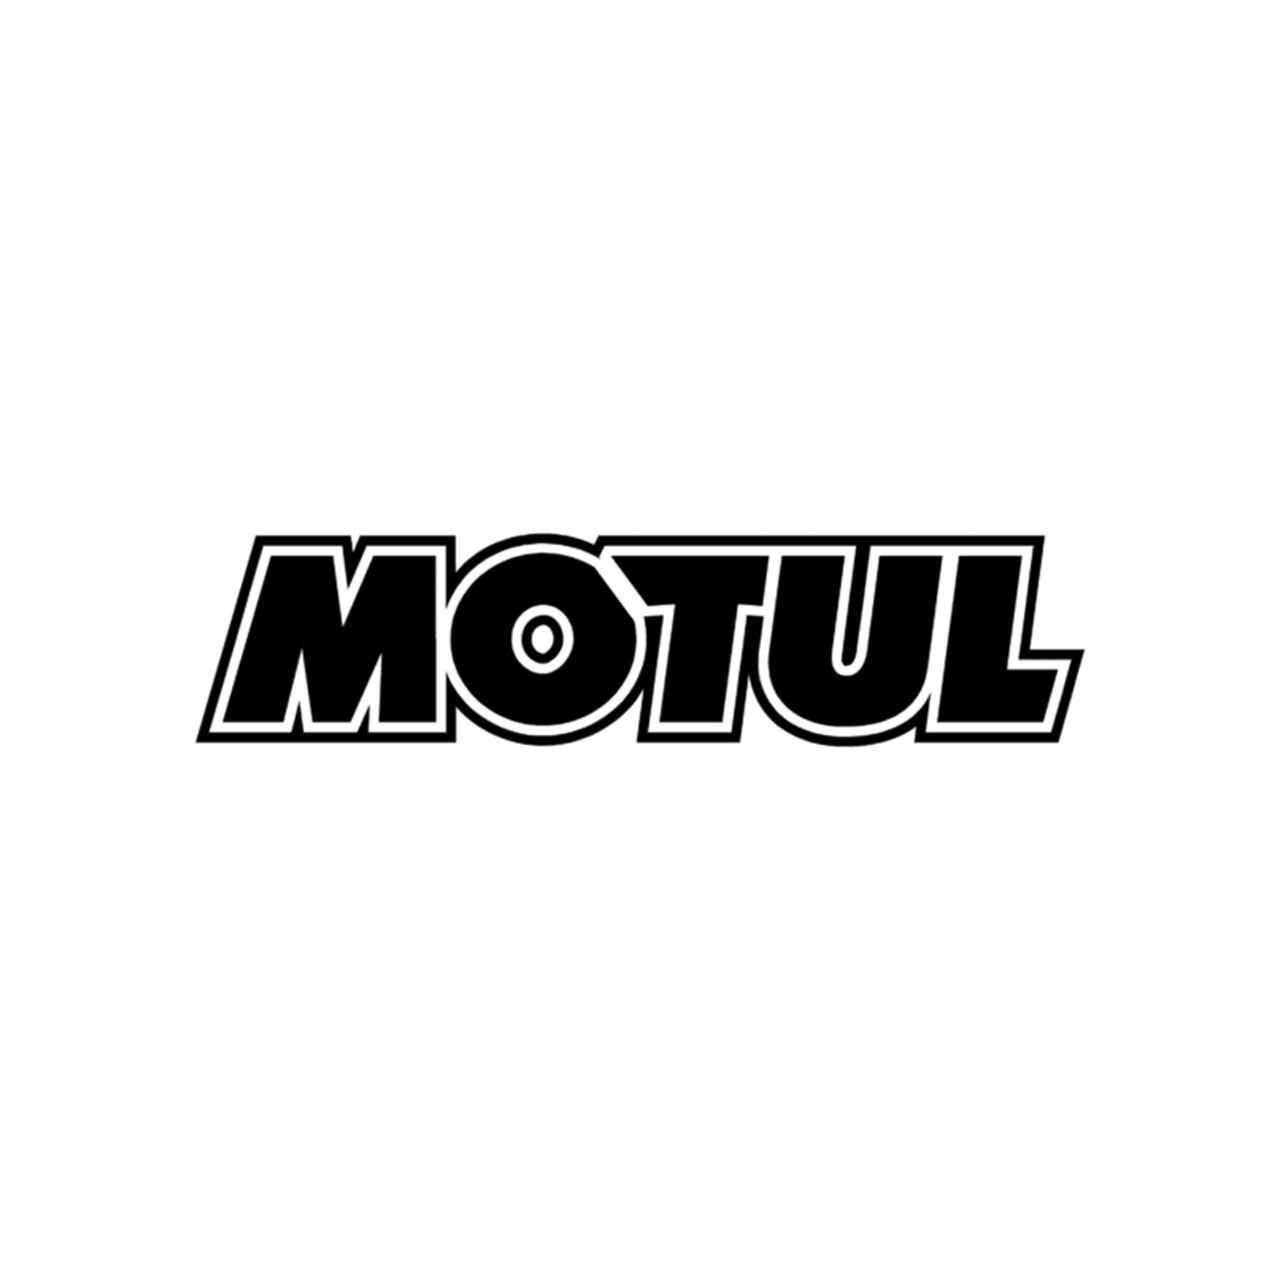 Motul Logo Vinyl Decal BallzBeatz . com in 2019.